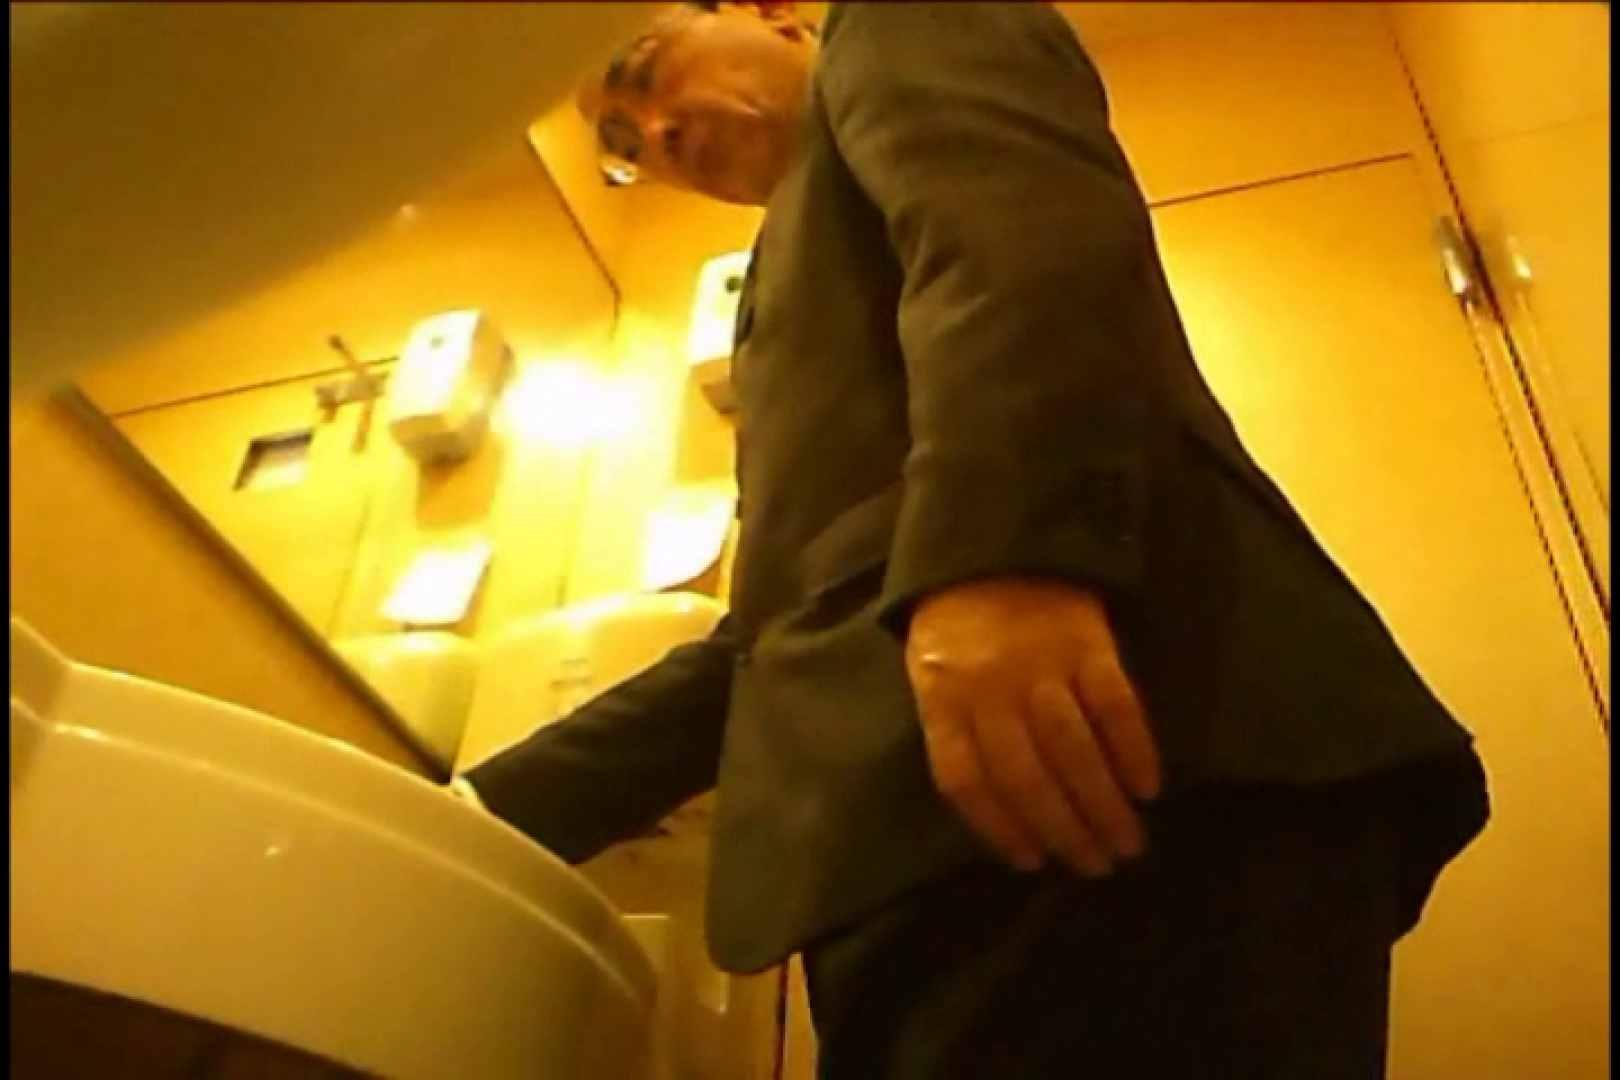 Gボーイ初投稿!掴み取りさんの洗面所覗き!in新幹線!VOL.01 スーツボーイズ | 男天国  103pic 15